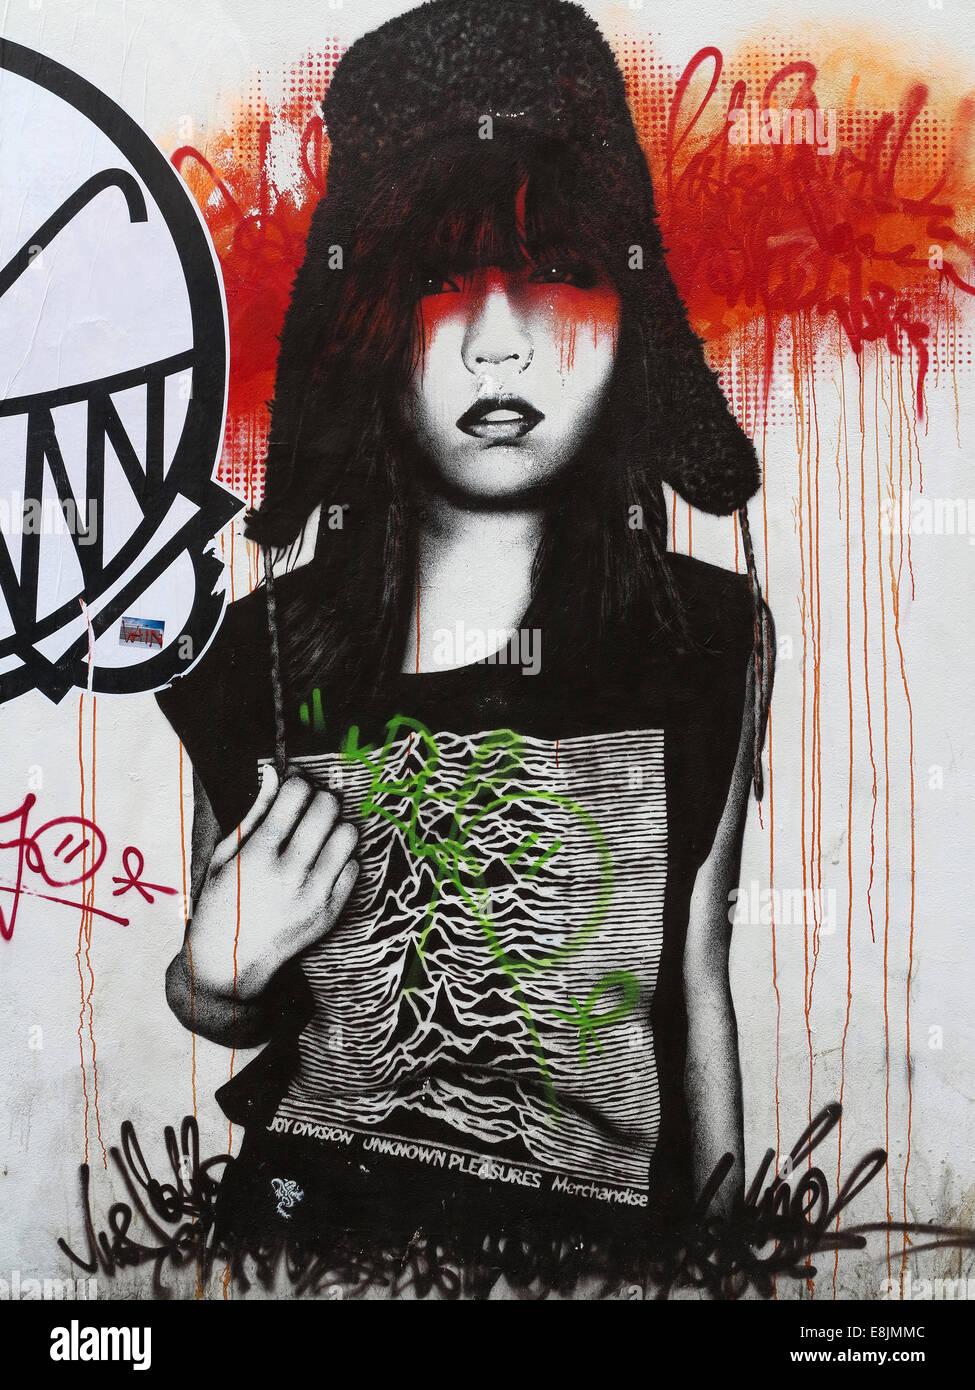 London street art - Joy Division - Stock Image